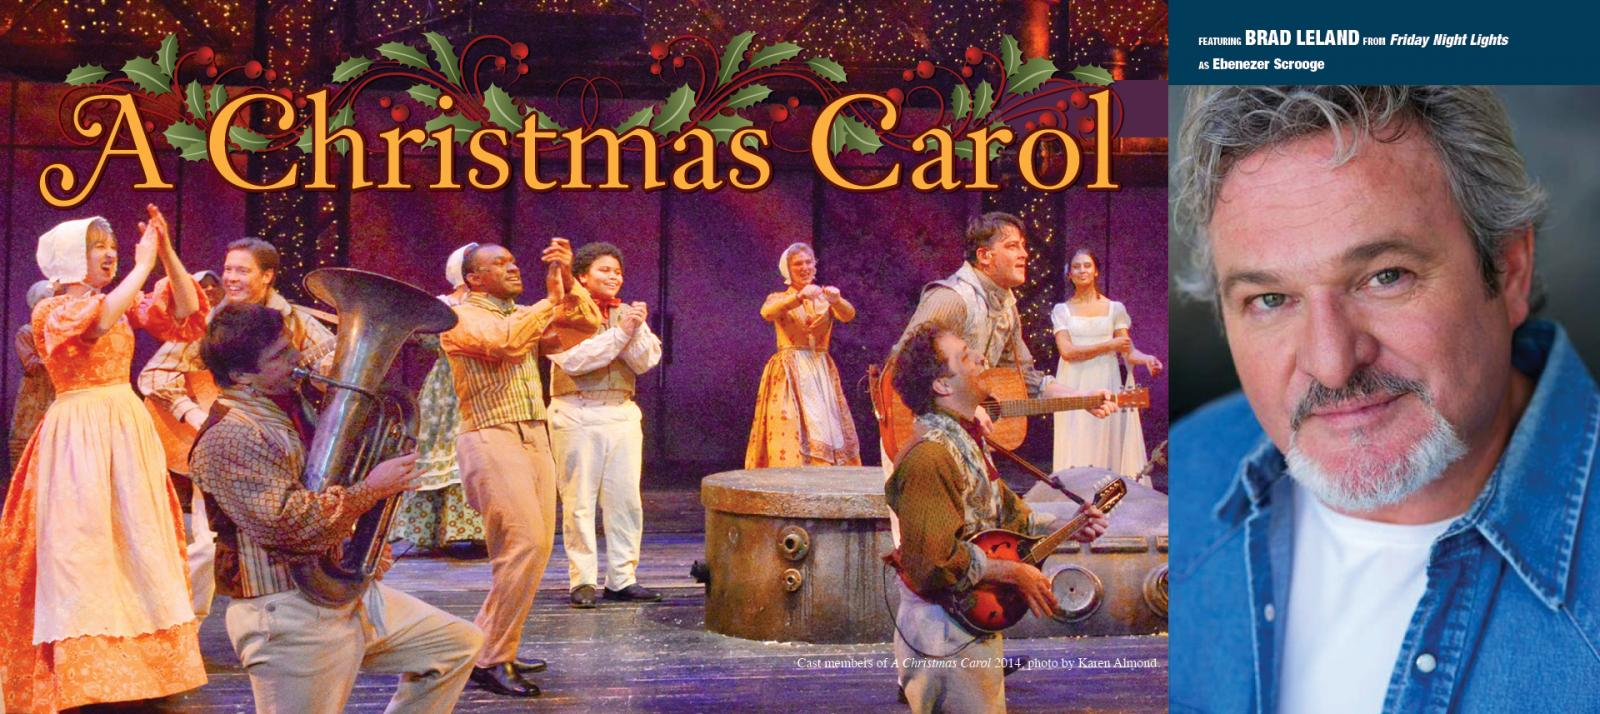 Dallas Theater Center's A Christmas Carol (Nov 22, 2017 @ 7:30 pm ...